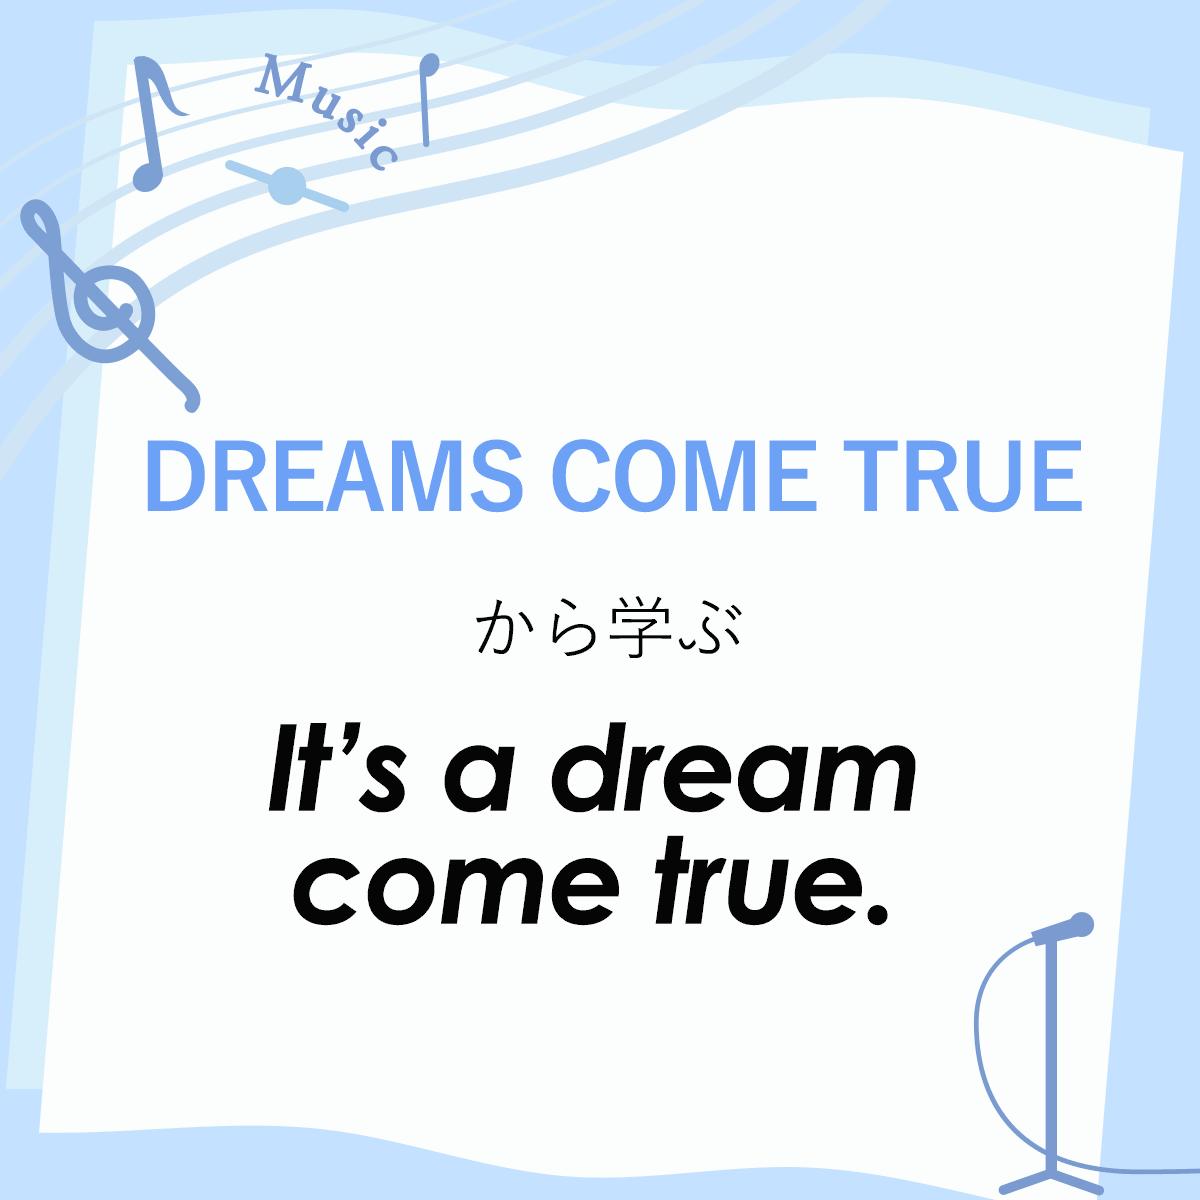 dream come true 01 ดรีม คัม ทรู ตอน01/1 - dream come true thailand ep01/1 #แป้ง_วรรษพร_ว่องไว # lift_up_your_life_upgrade_your_dream #ยกระดับอัพเกรดทุกความฝัน #dct.